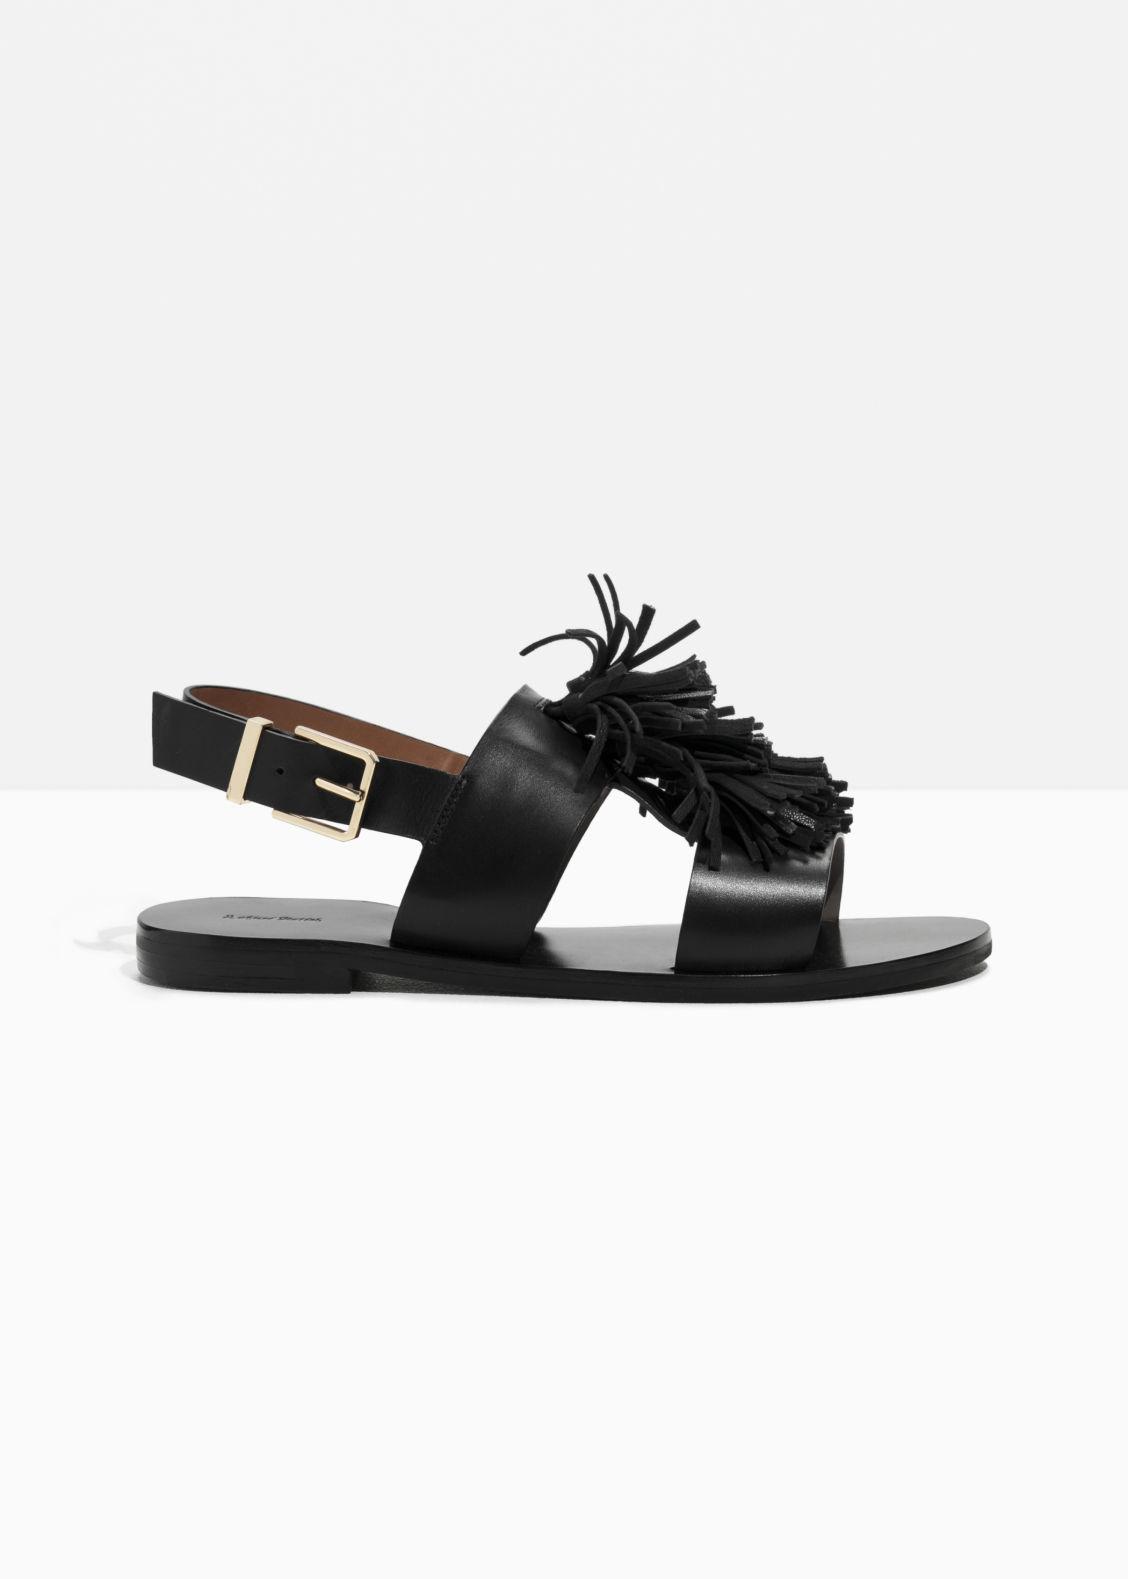 Tassel Leather Sandal Black Flat sandals & Other Stories